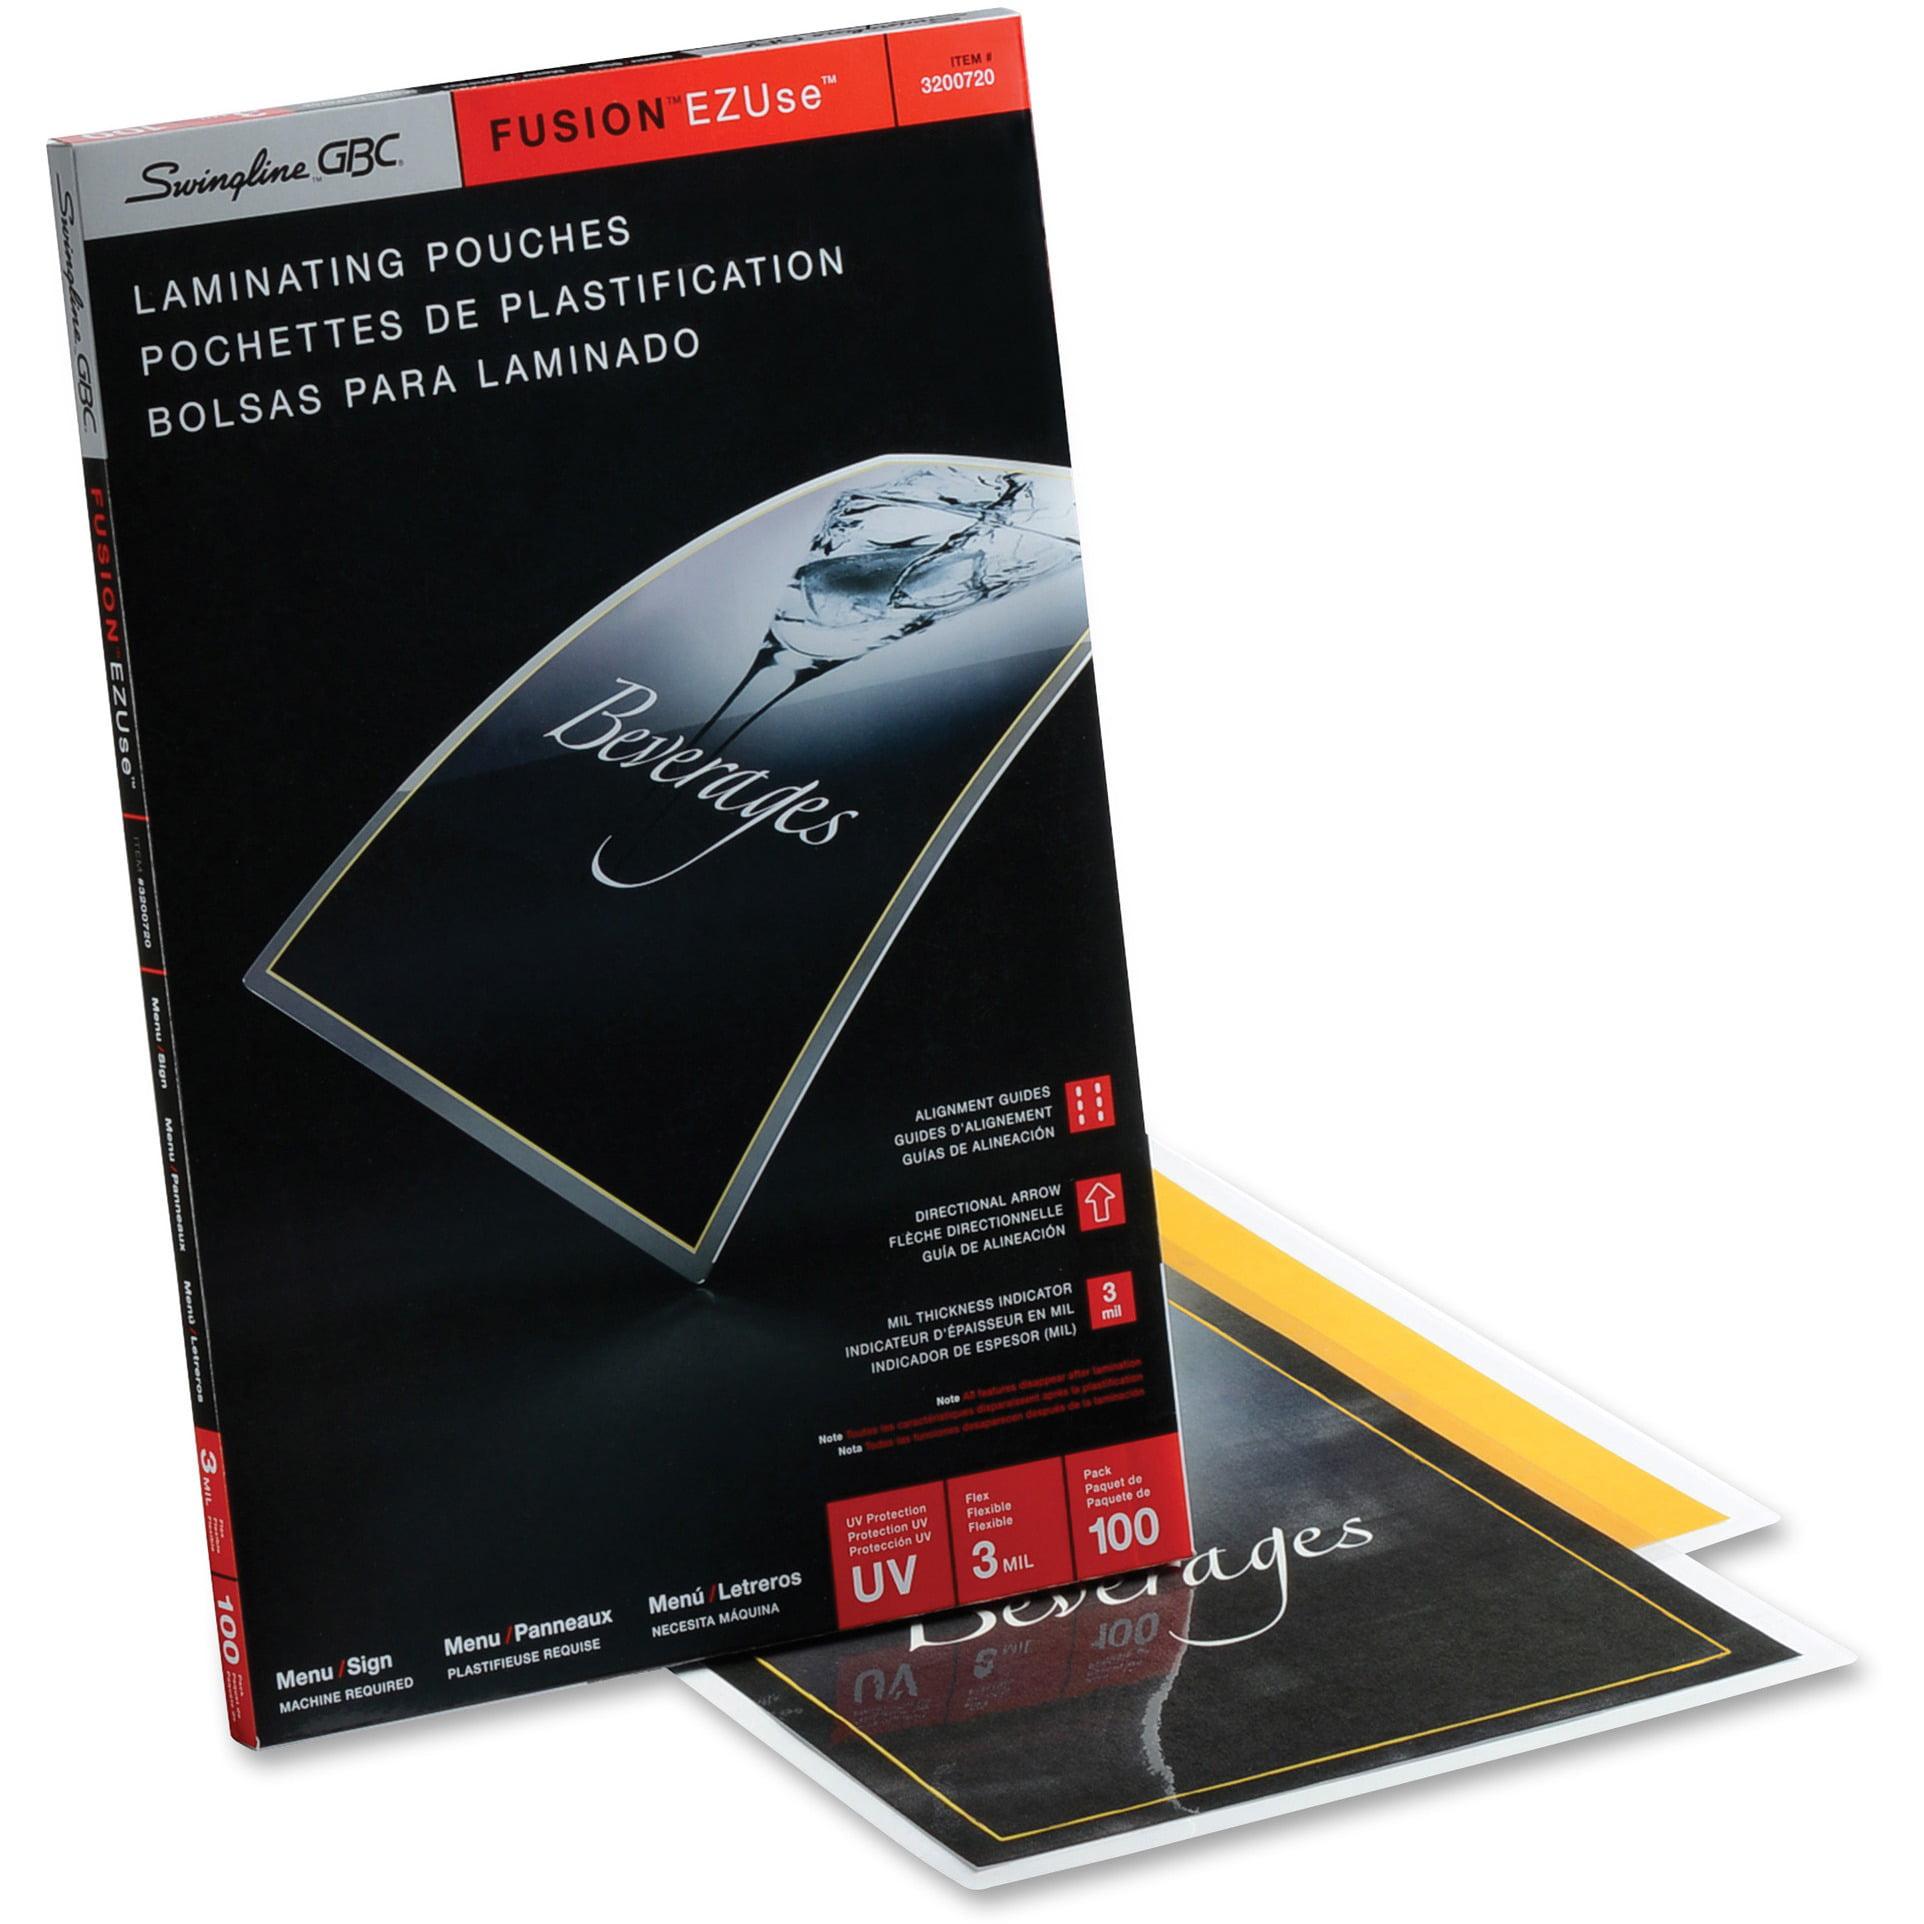 Swingline GBC, SWI3200720, EZUse™ Thermal Laminating Pouches, 100 / Box, Clear